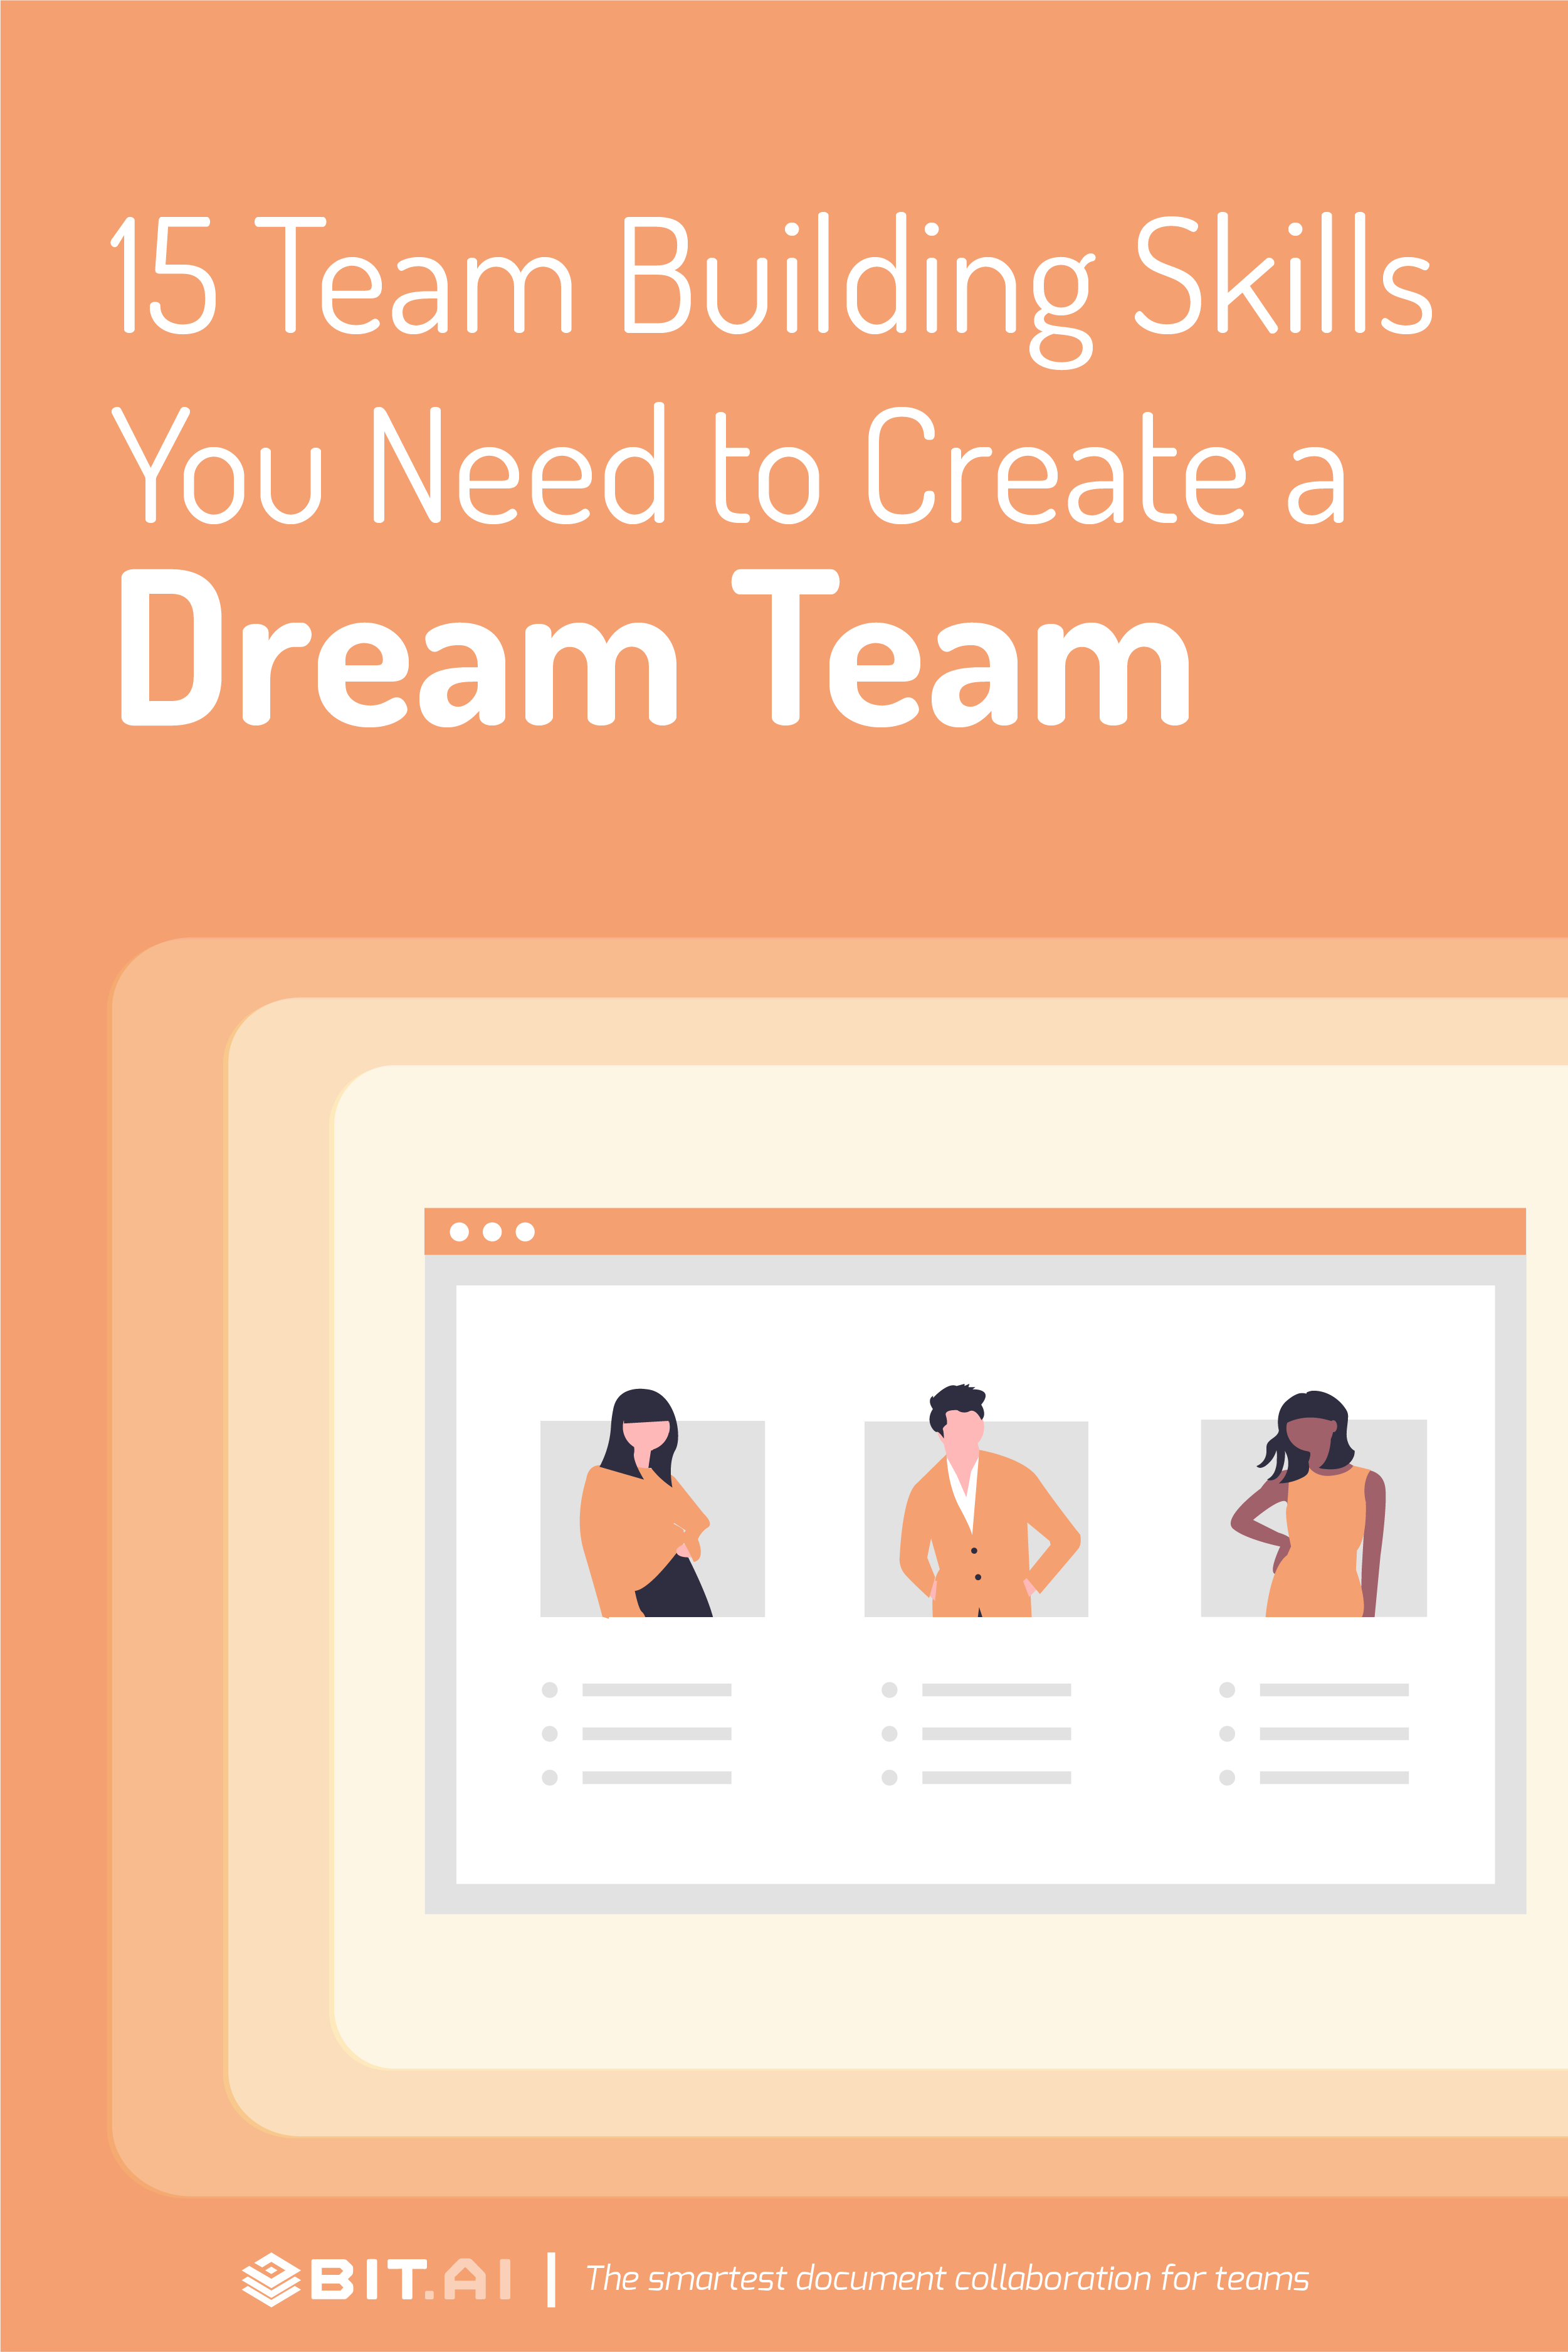 Team building skills - Pinterest